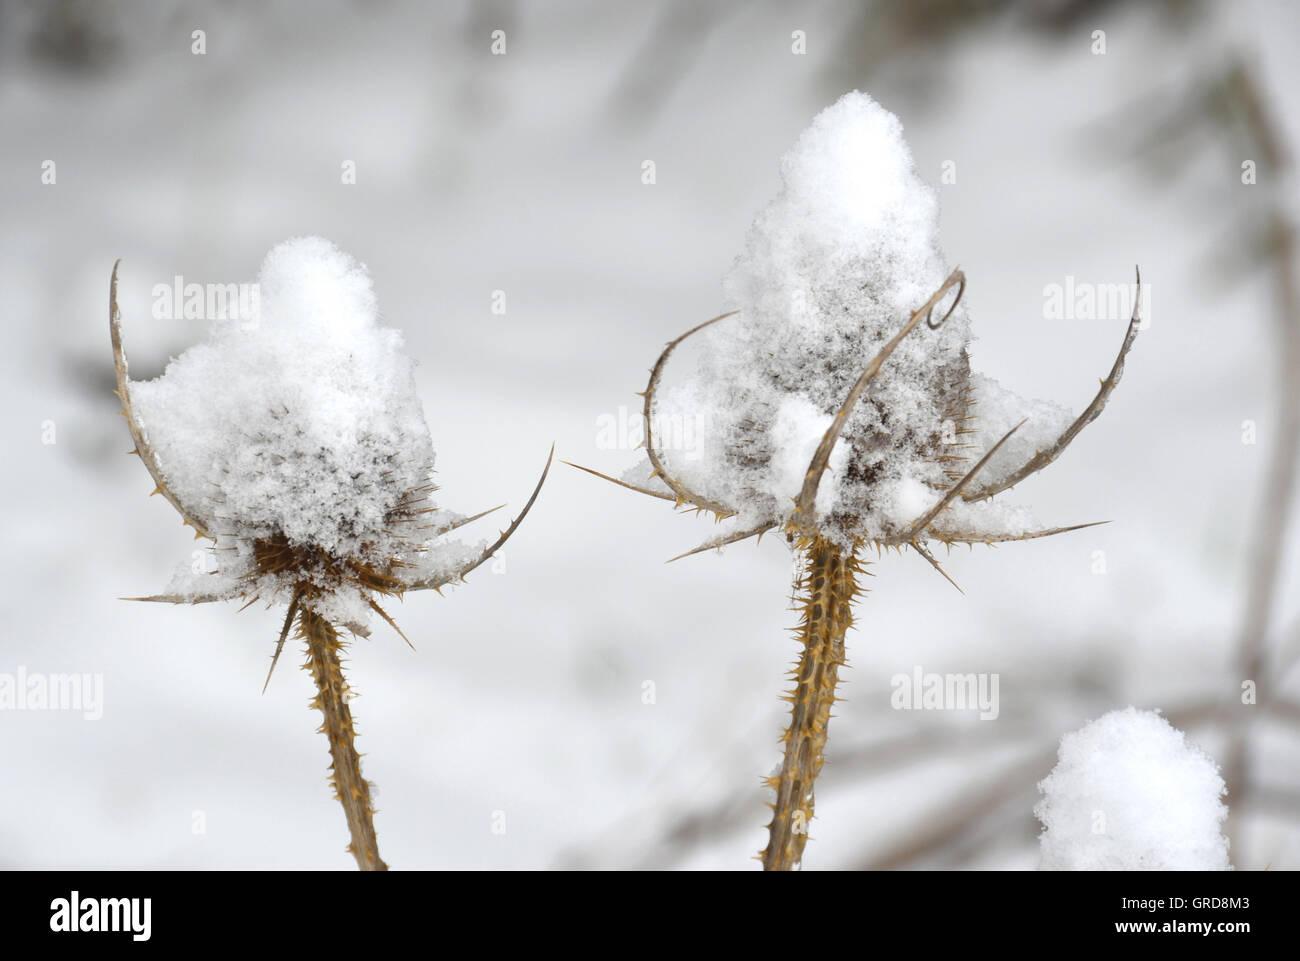 Snow Adorning Dried Thistles, Wild Teasel, Dipsacus Fullonum - Stock Image